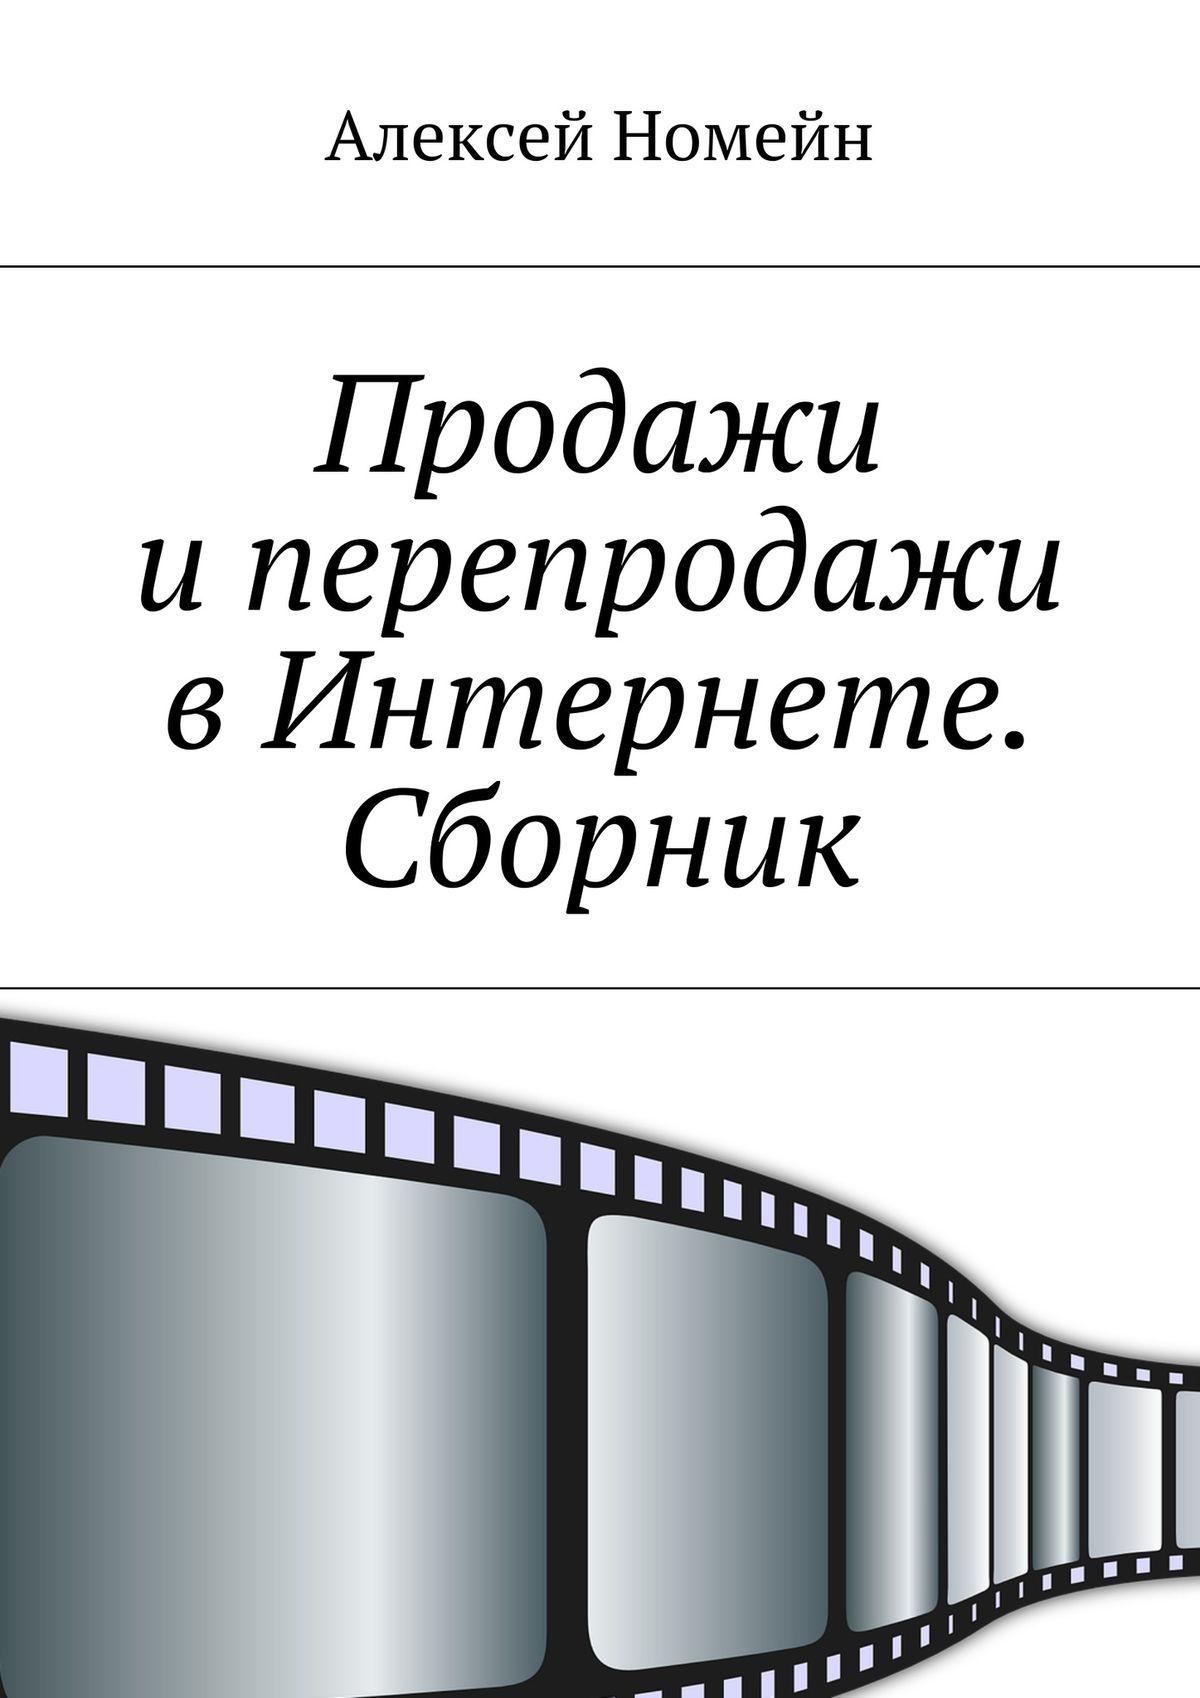 Алексей Номейн Продажи иперепродажи в Интернете. Сборник алексей номейн деньги винтернете isbn 9785448555268